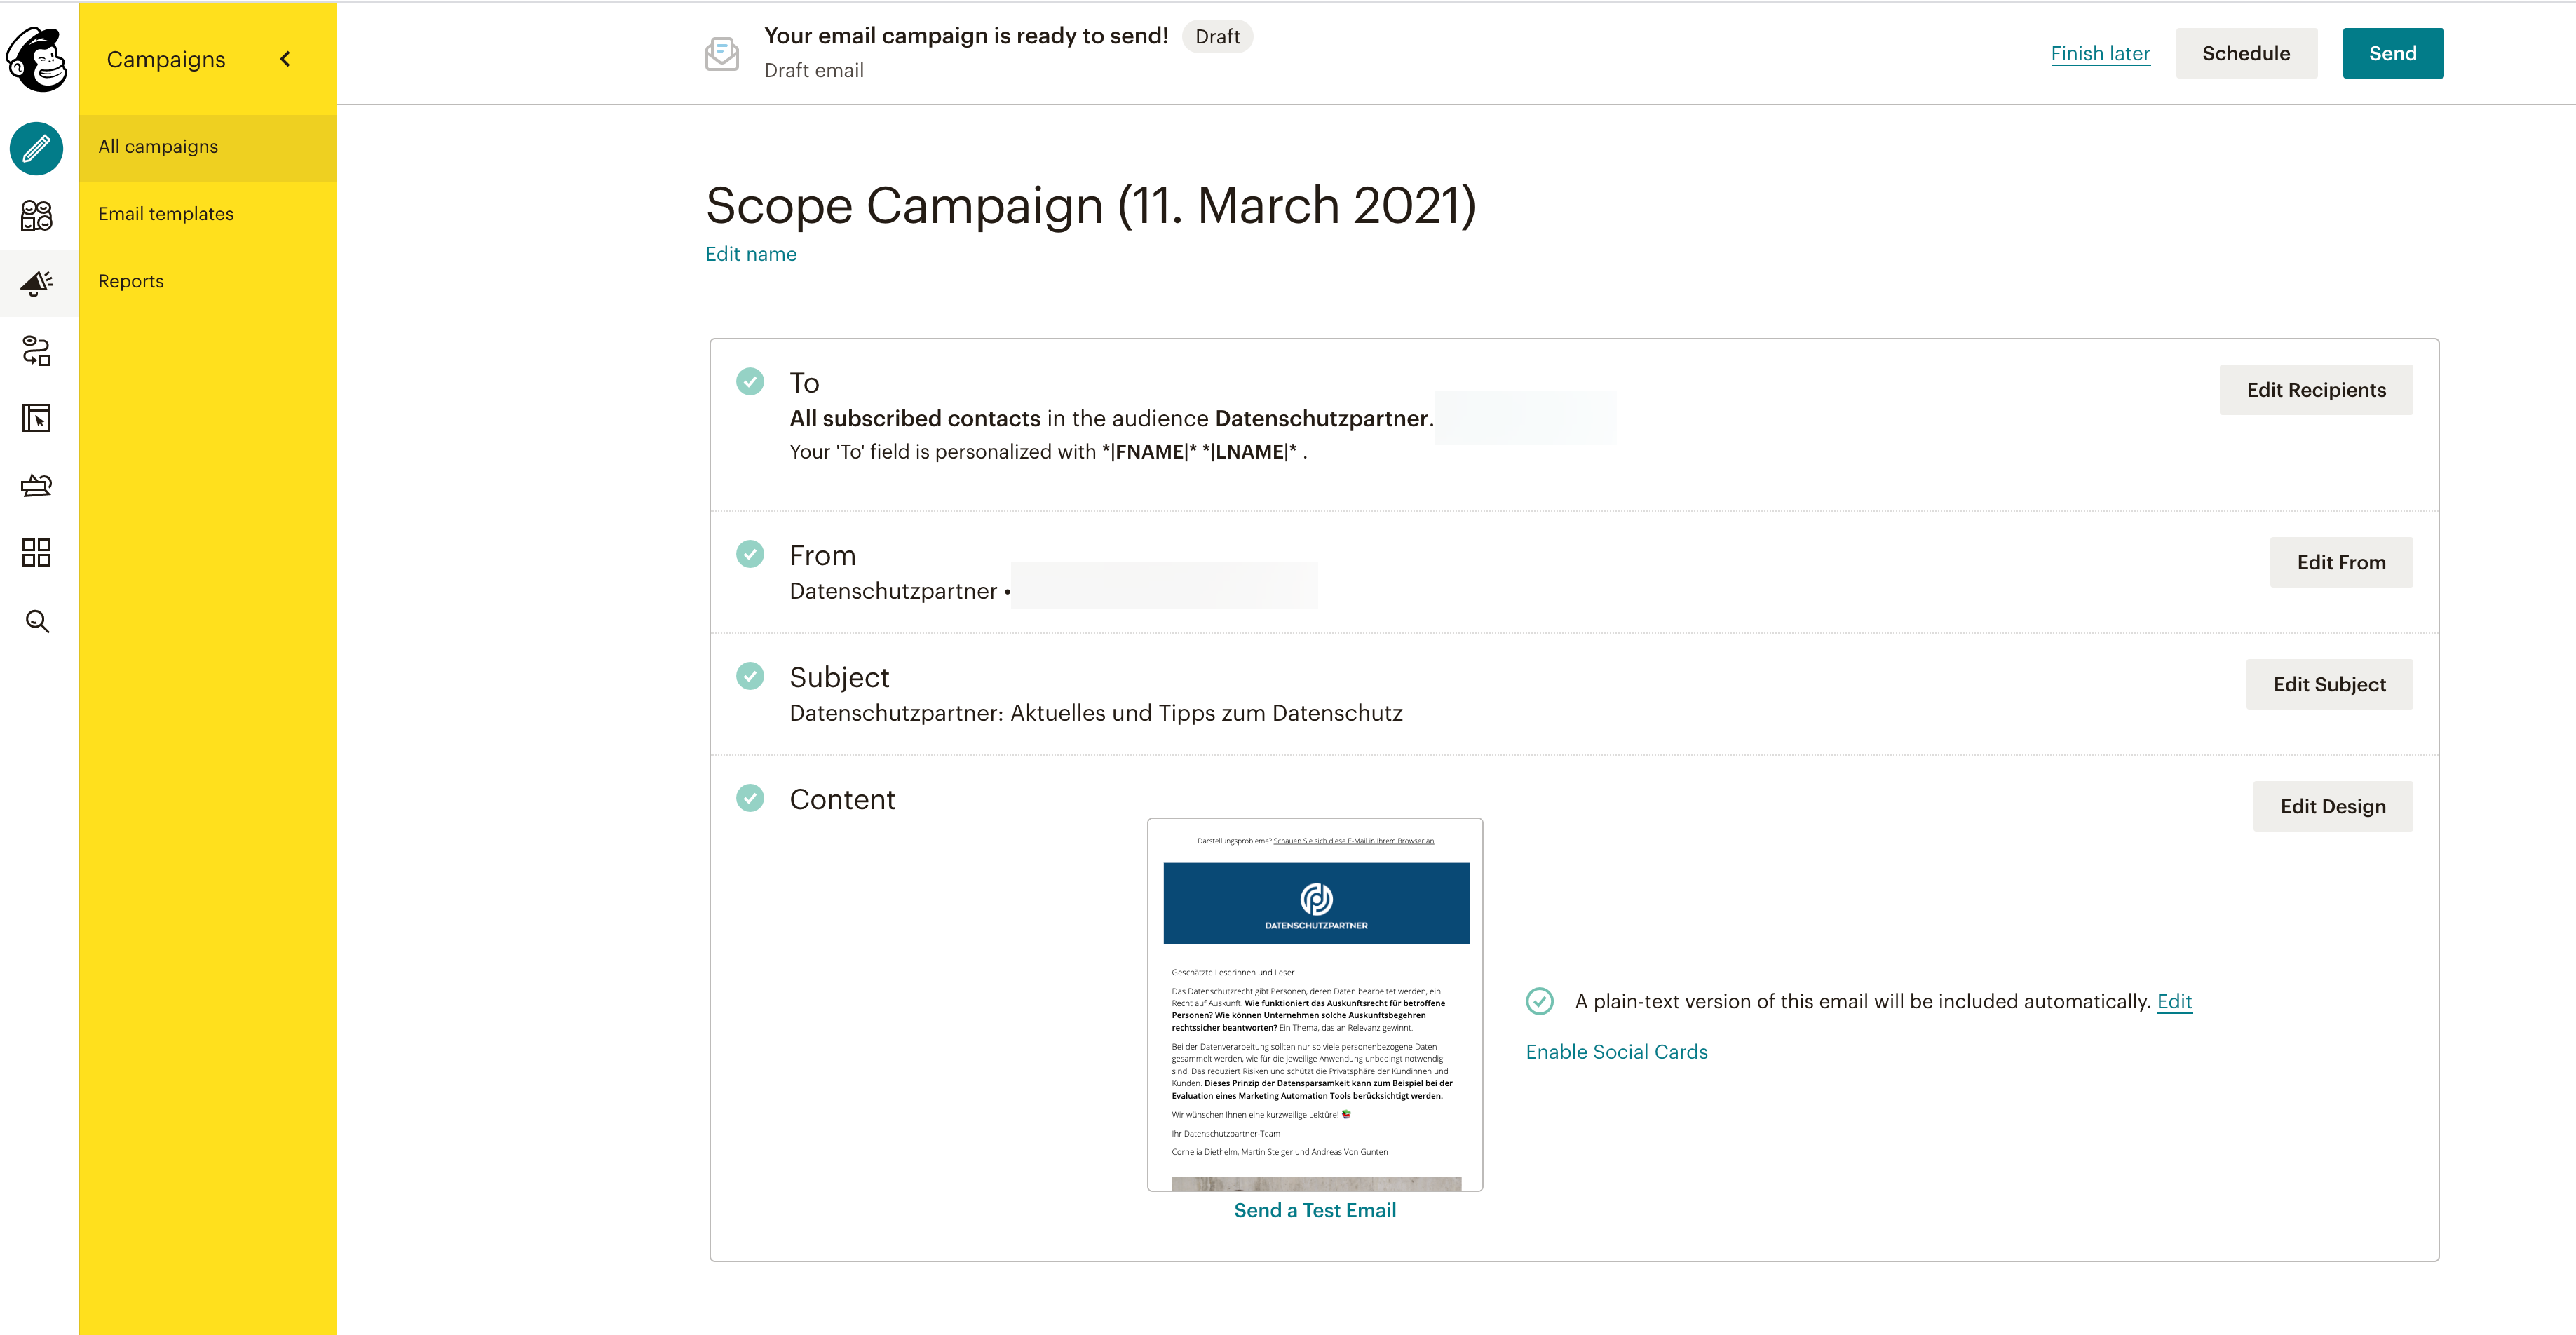 mailchimp datenschutzpartner scope